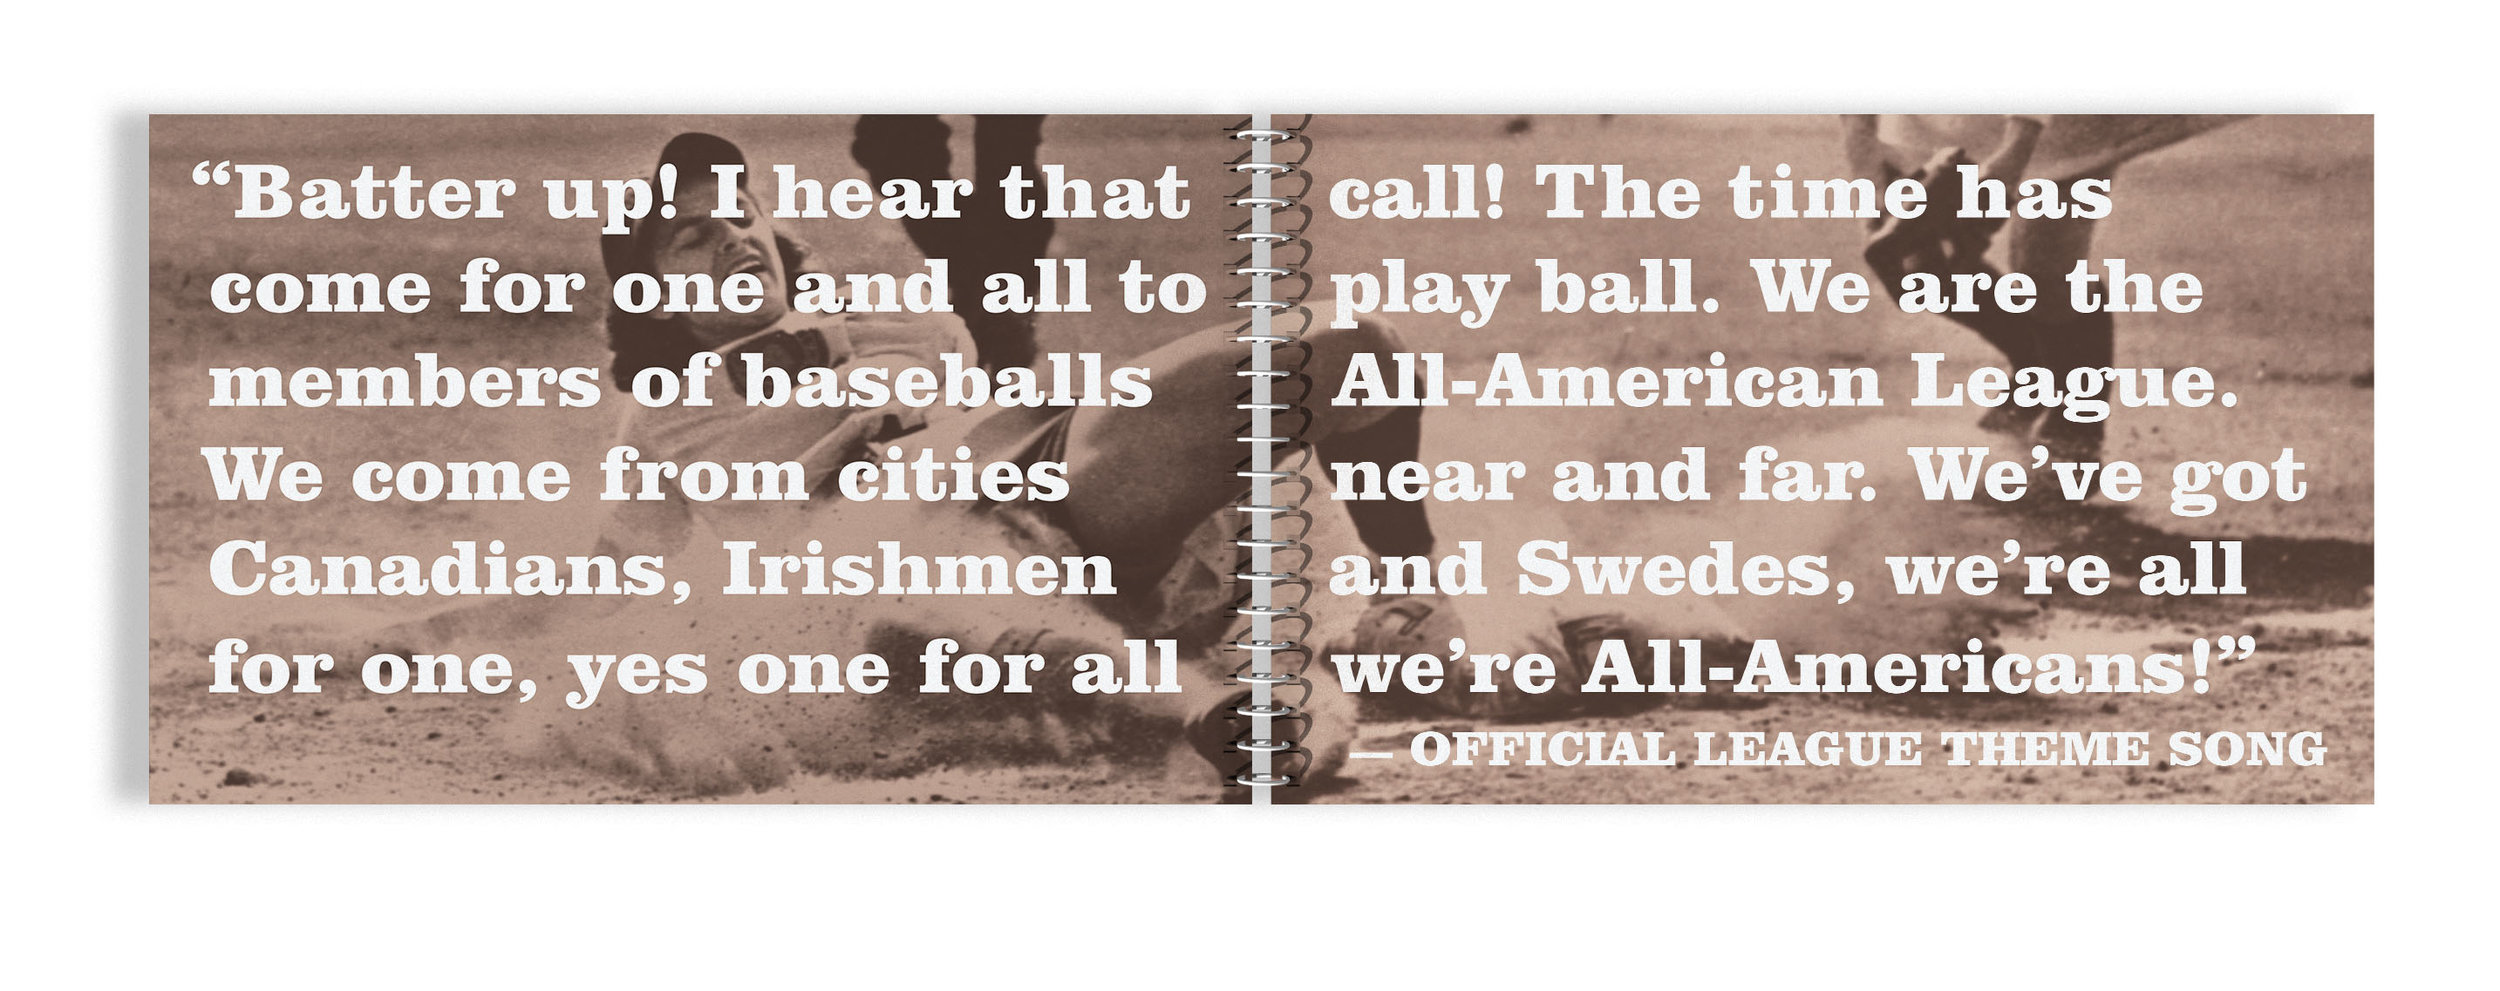 Baseball book theme song.jpg